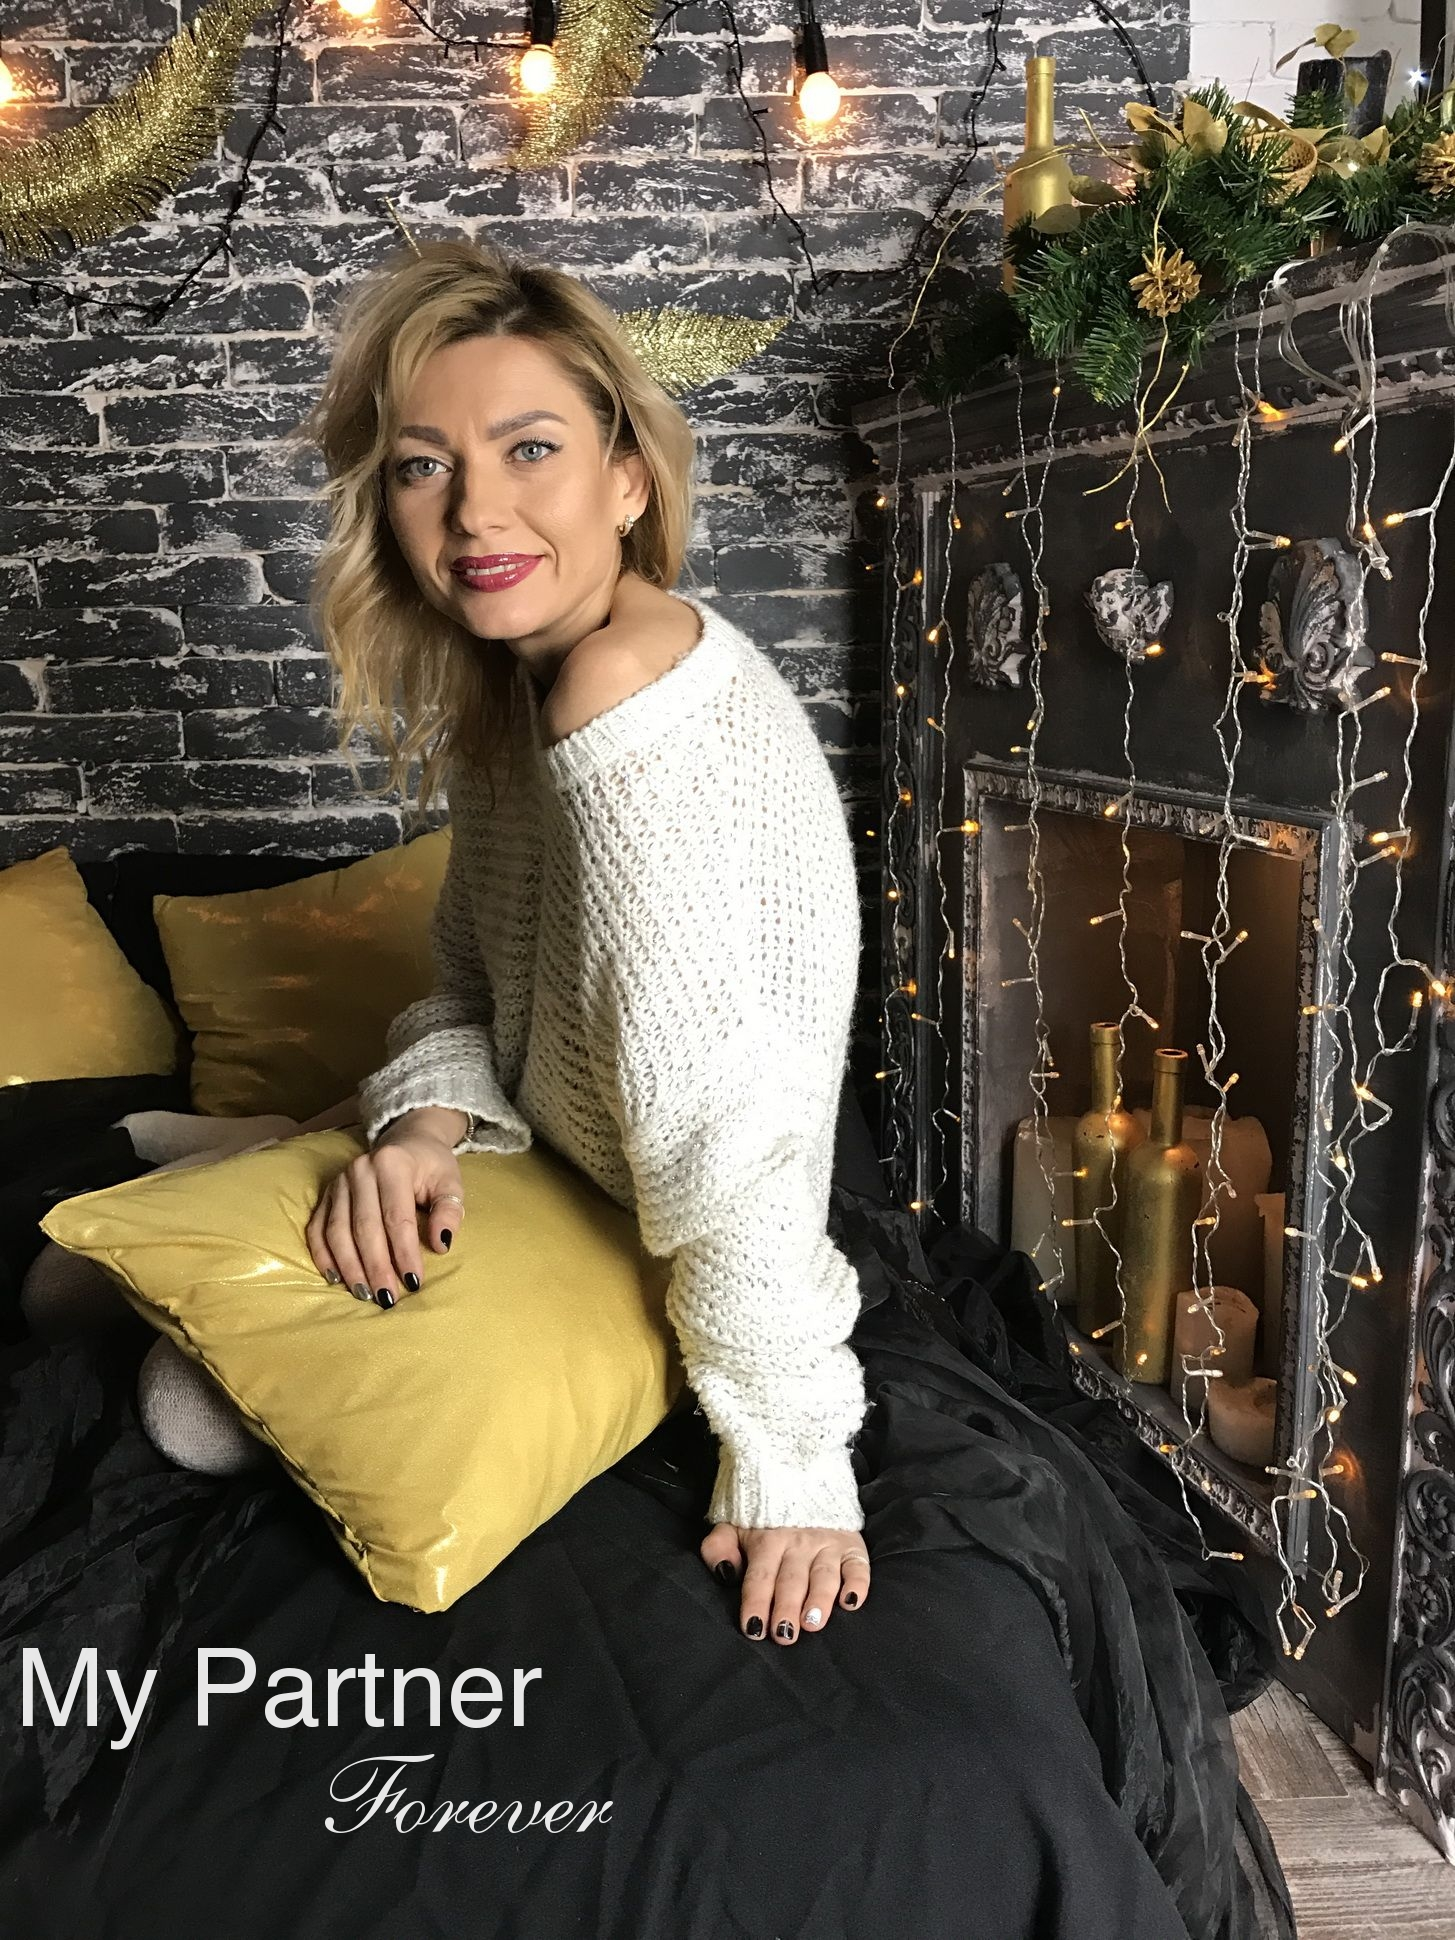 Dating Site to Meet Beautiful Ukrainian Lady Tatiyana from Poltava, Ukraine